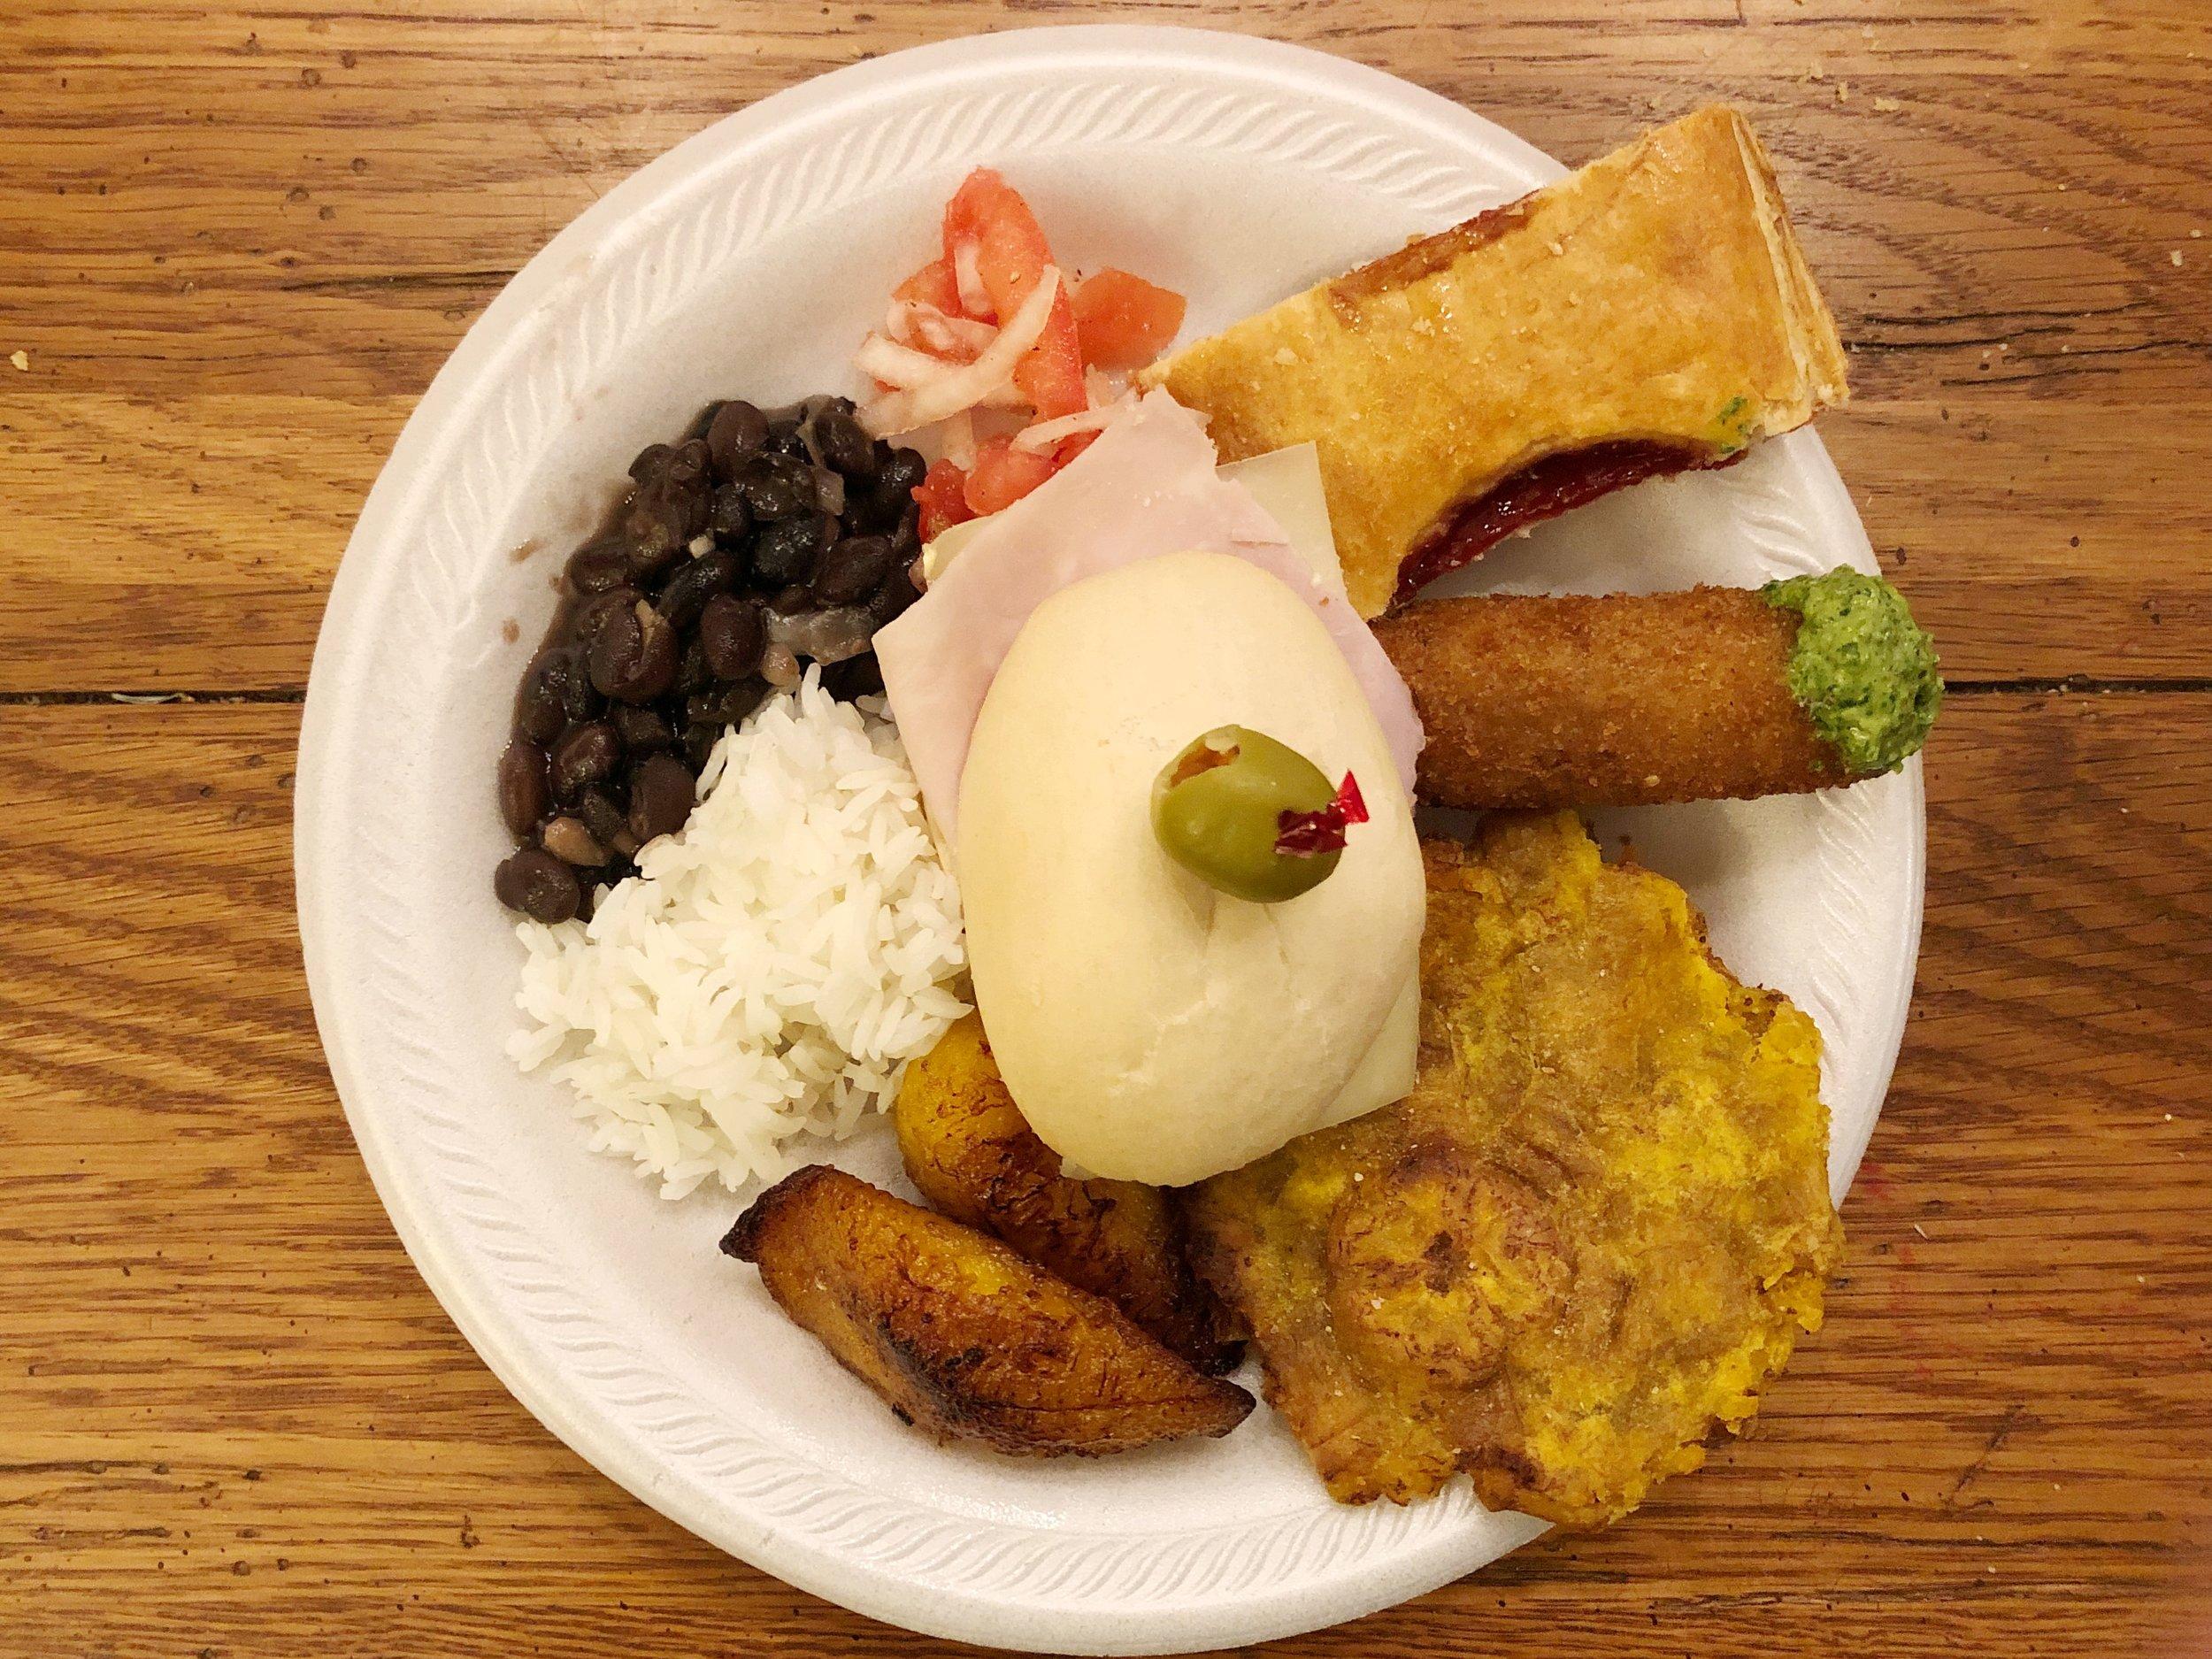 cuban-birthday-party-dinner-plate